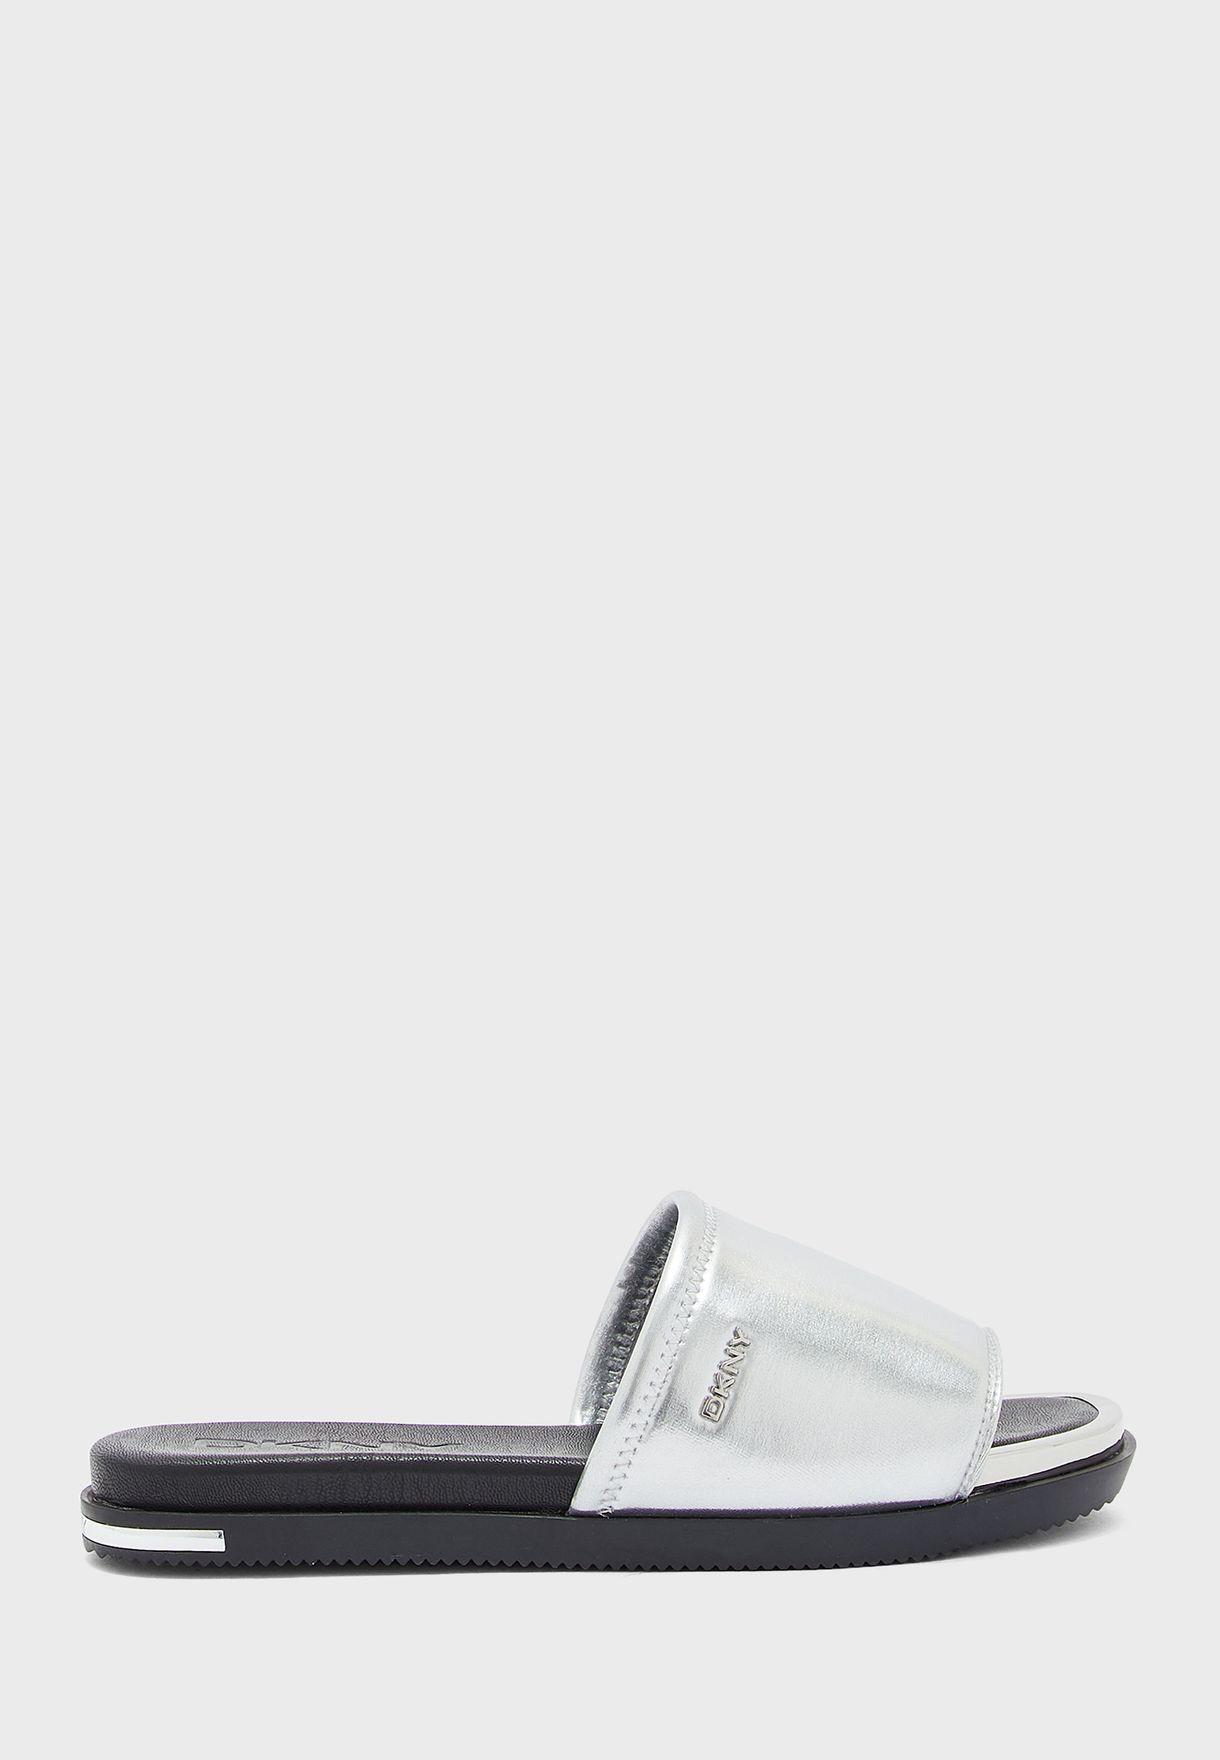 Briley Flat Sandals